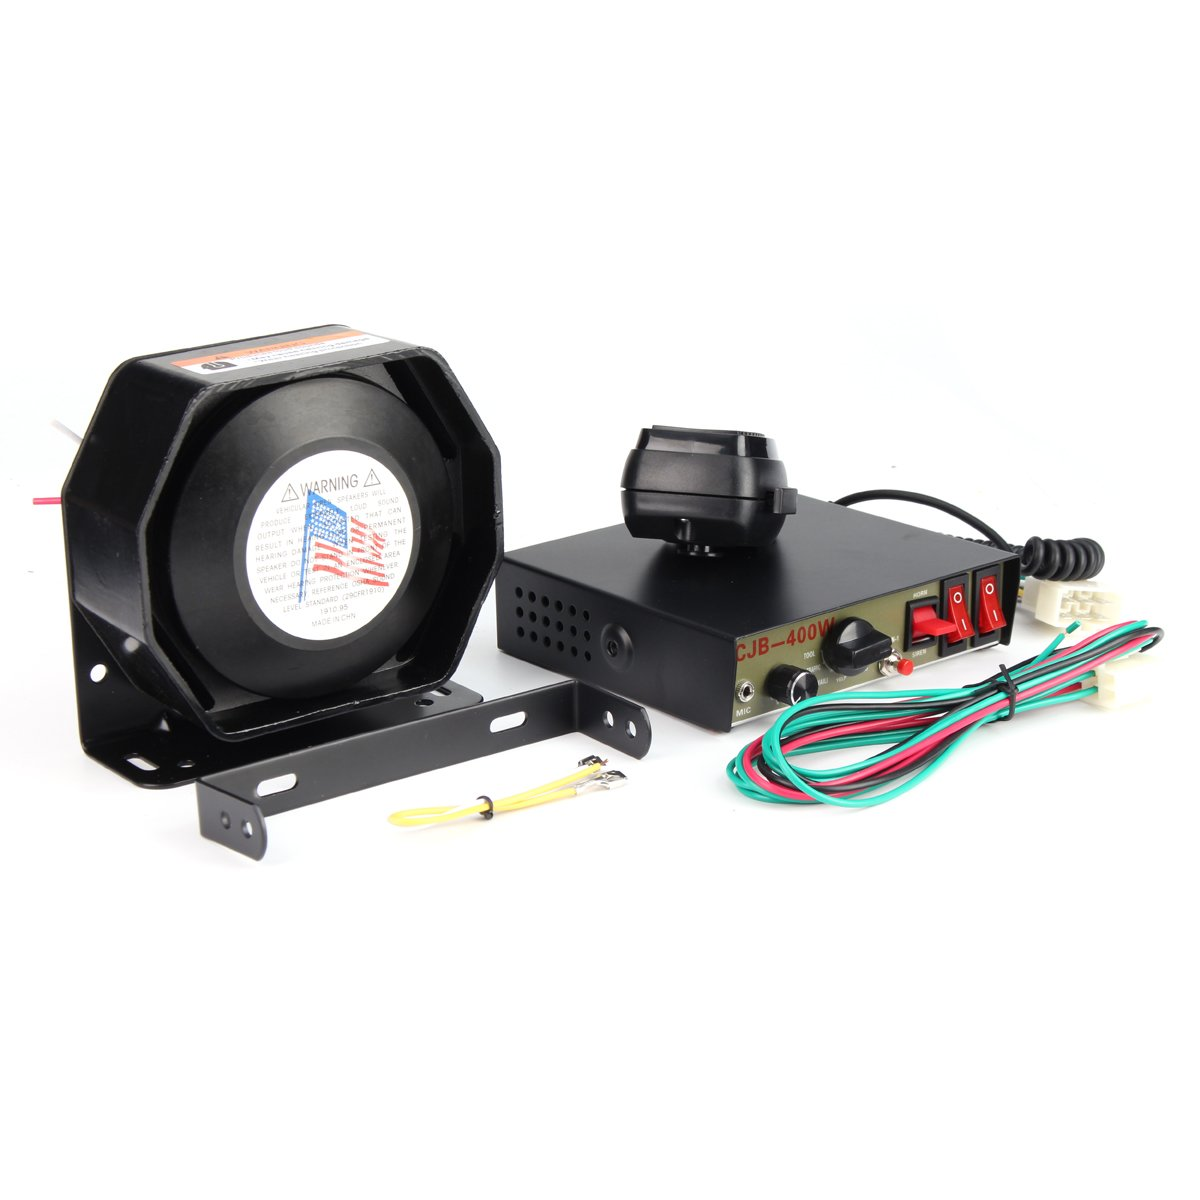 400W 8 Sound Loud Car Warning Alarm Police Fire Siren Horn PA Speaker MIC System